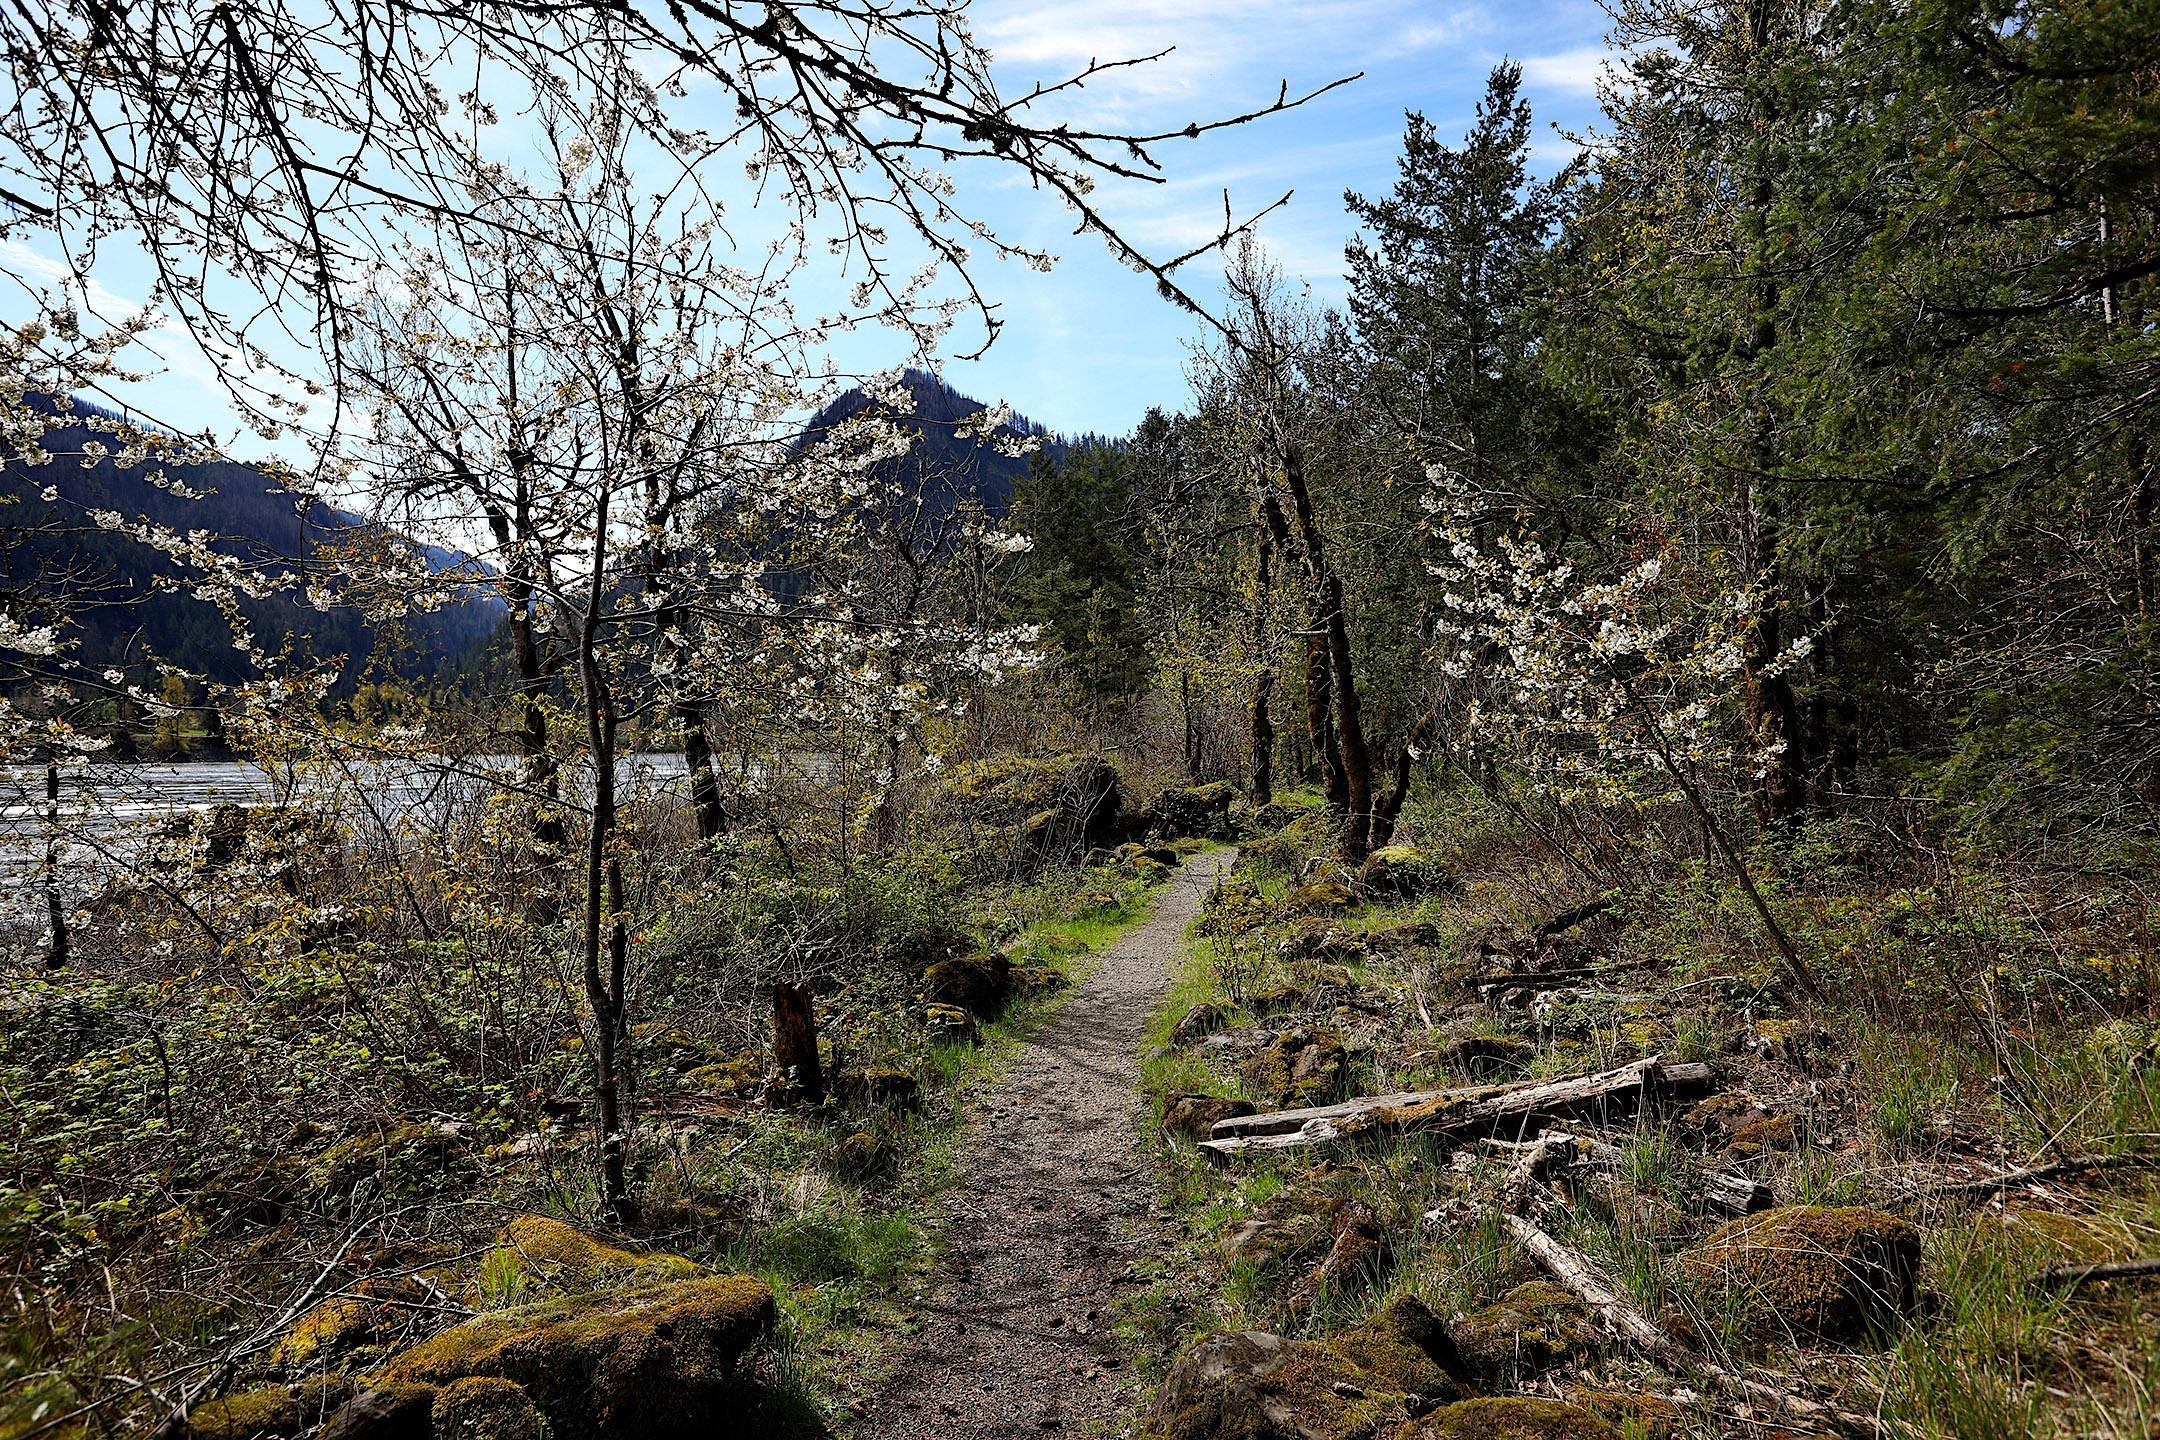 CANCELLED: Fort Cascades History Walk, WA